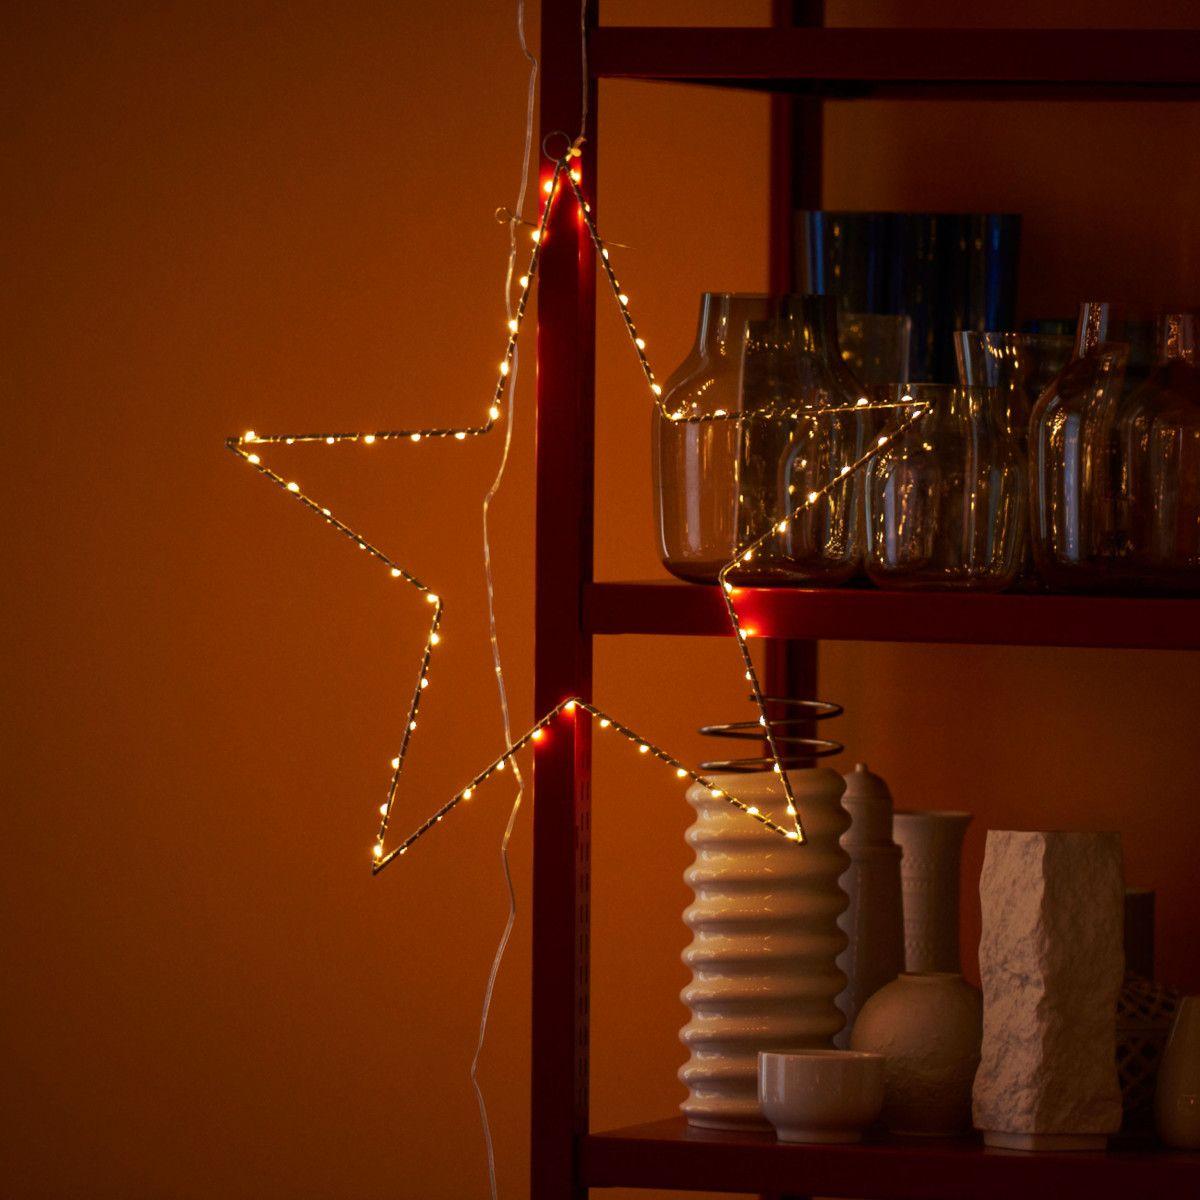 Yilva LED Leuchtstern 50 silber Jetzt bestellen unter: https://moebel.ladendirekt.de/weihnachten/weihnachtsbeleuchtung/?uid=33479226-5ea3-5c1f-8e66-eaed906671f1&utm_source=pinterest&utm_medium=pin&utm_campaign=boards #weihnachten #weihnachtsbeleuchtung